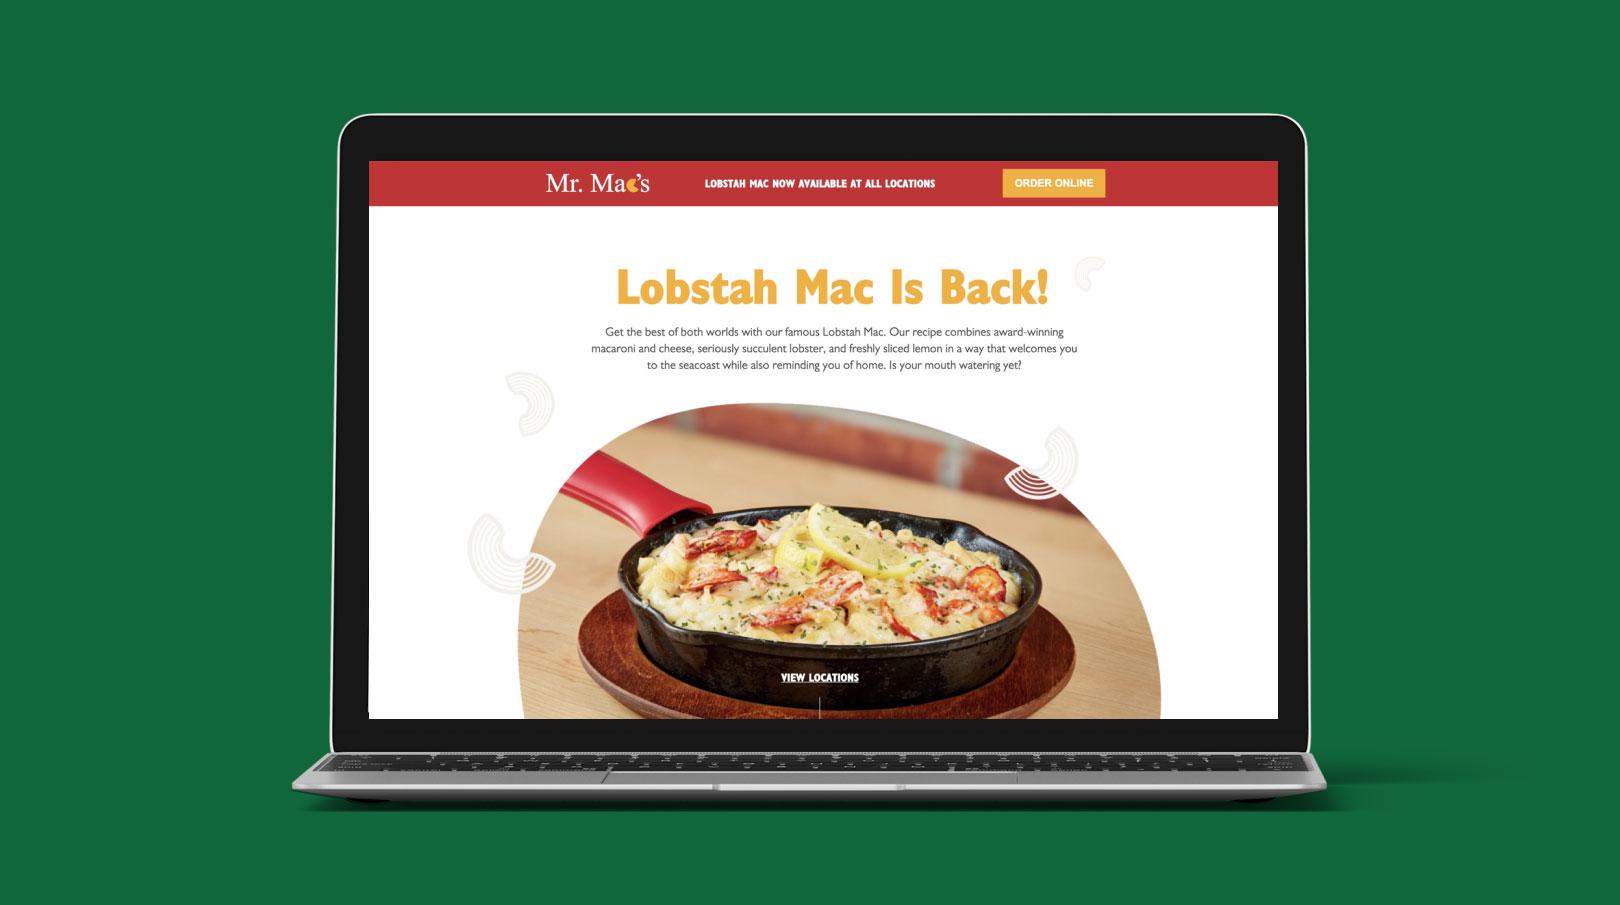 Mr. Mac's Landing Page